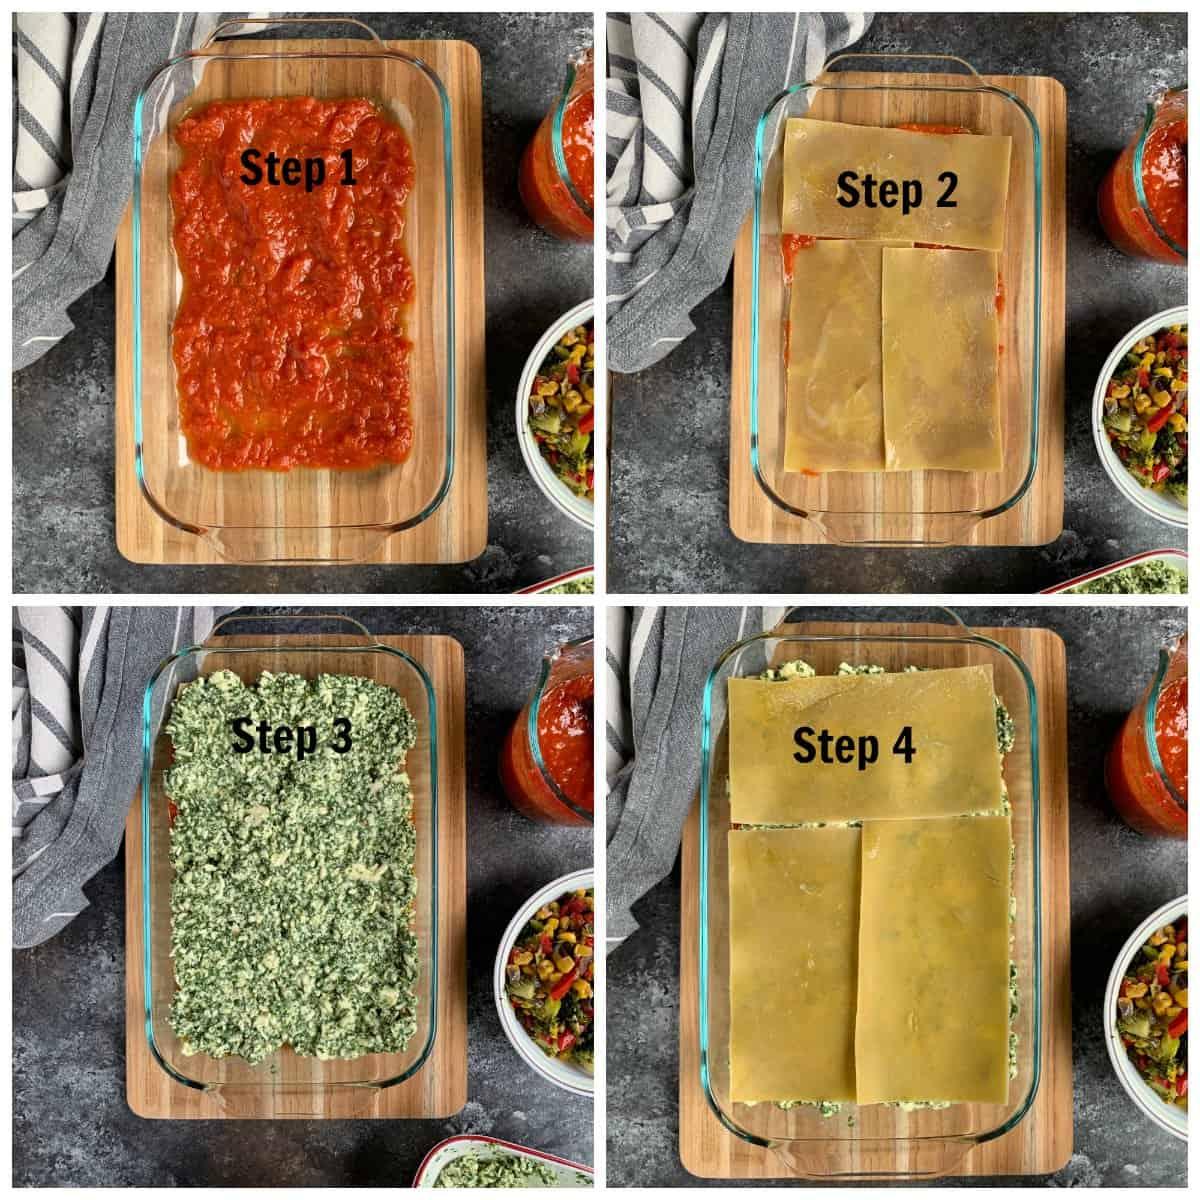 Steps in layering lasagna in a pan